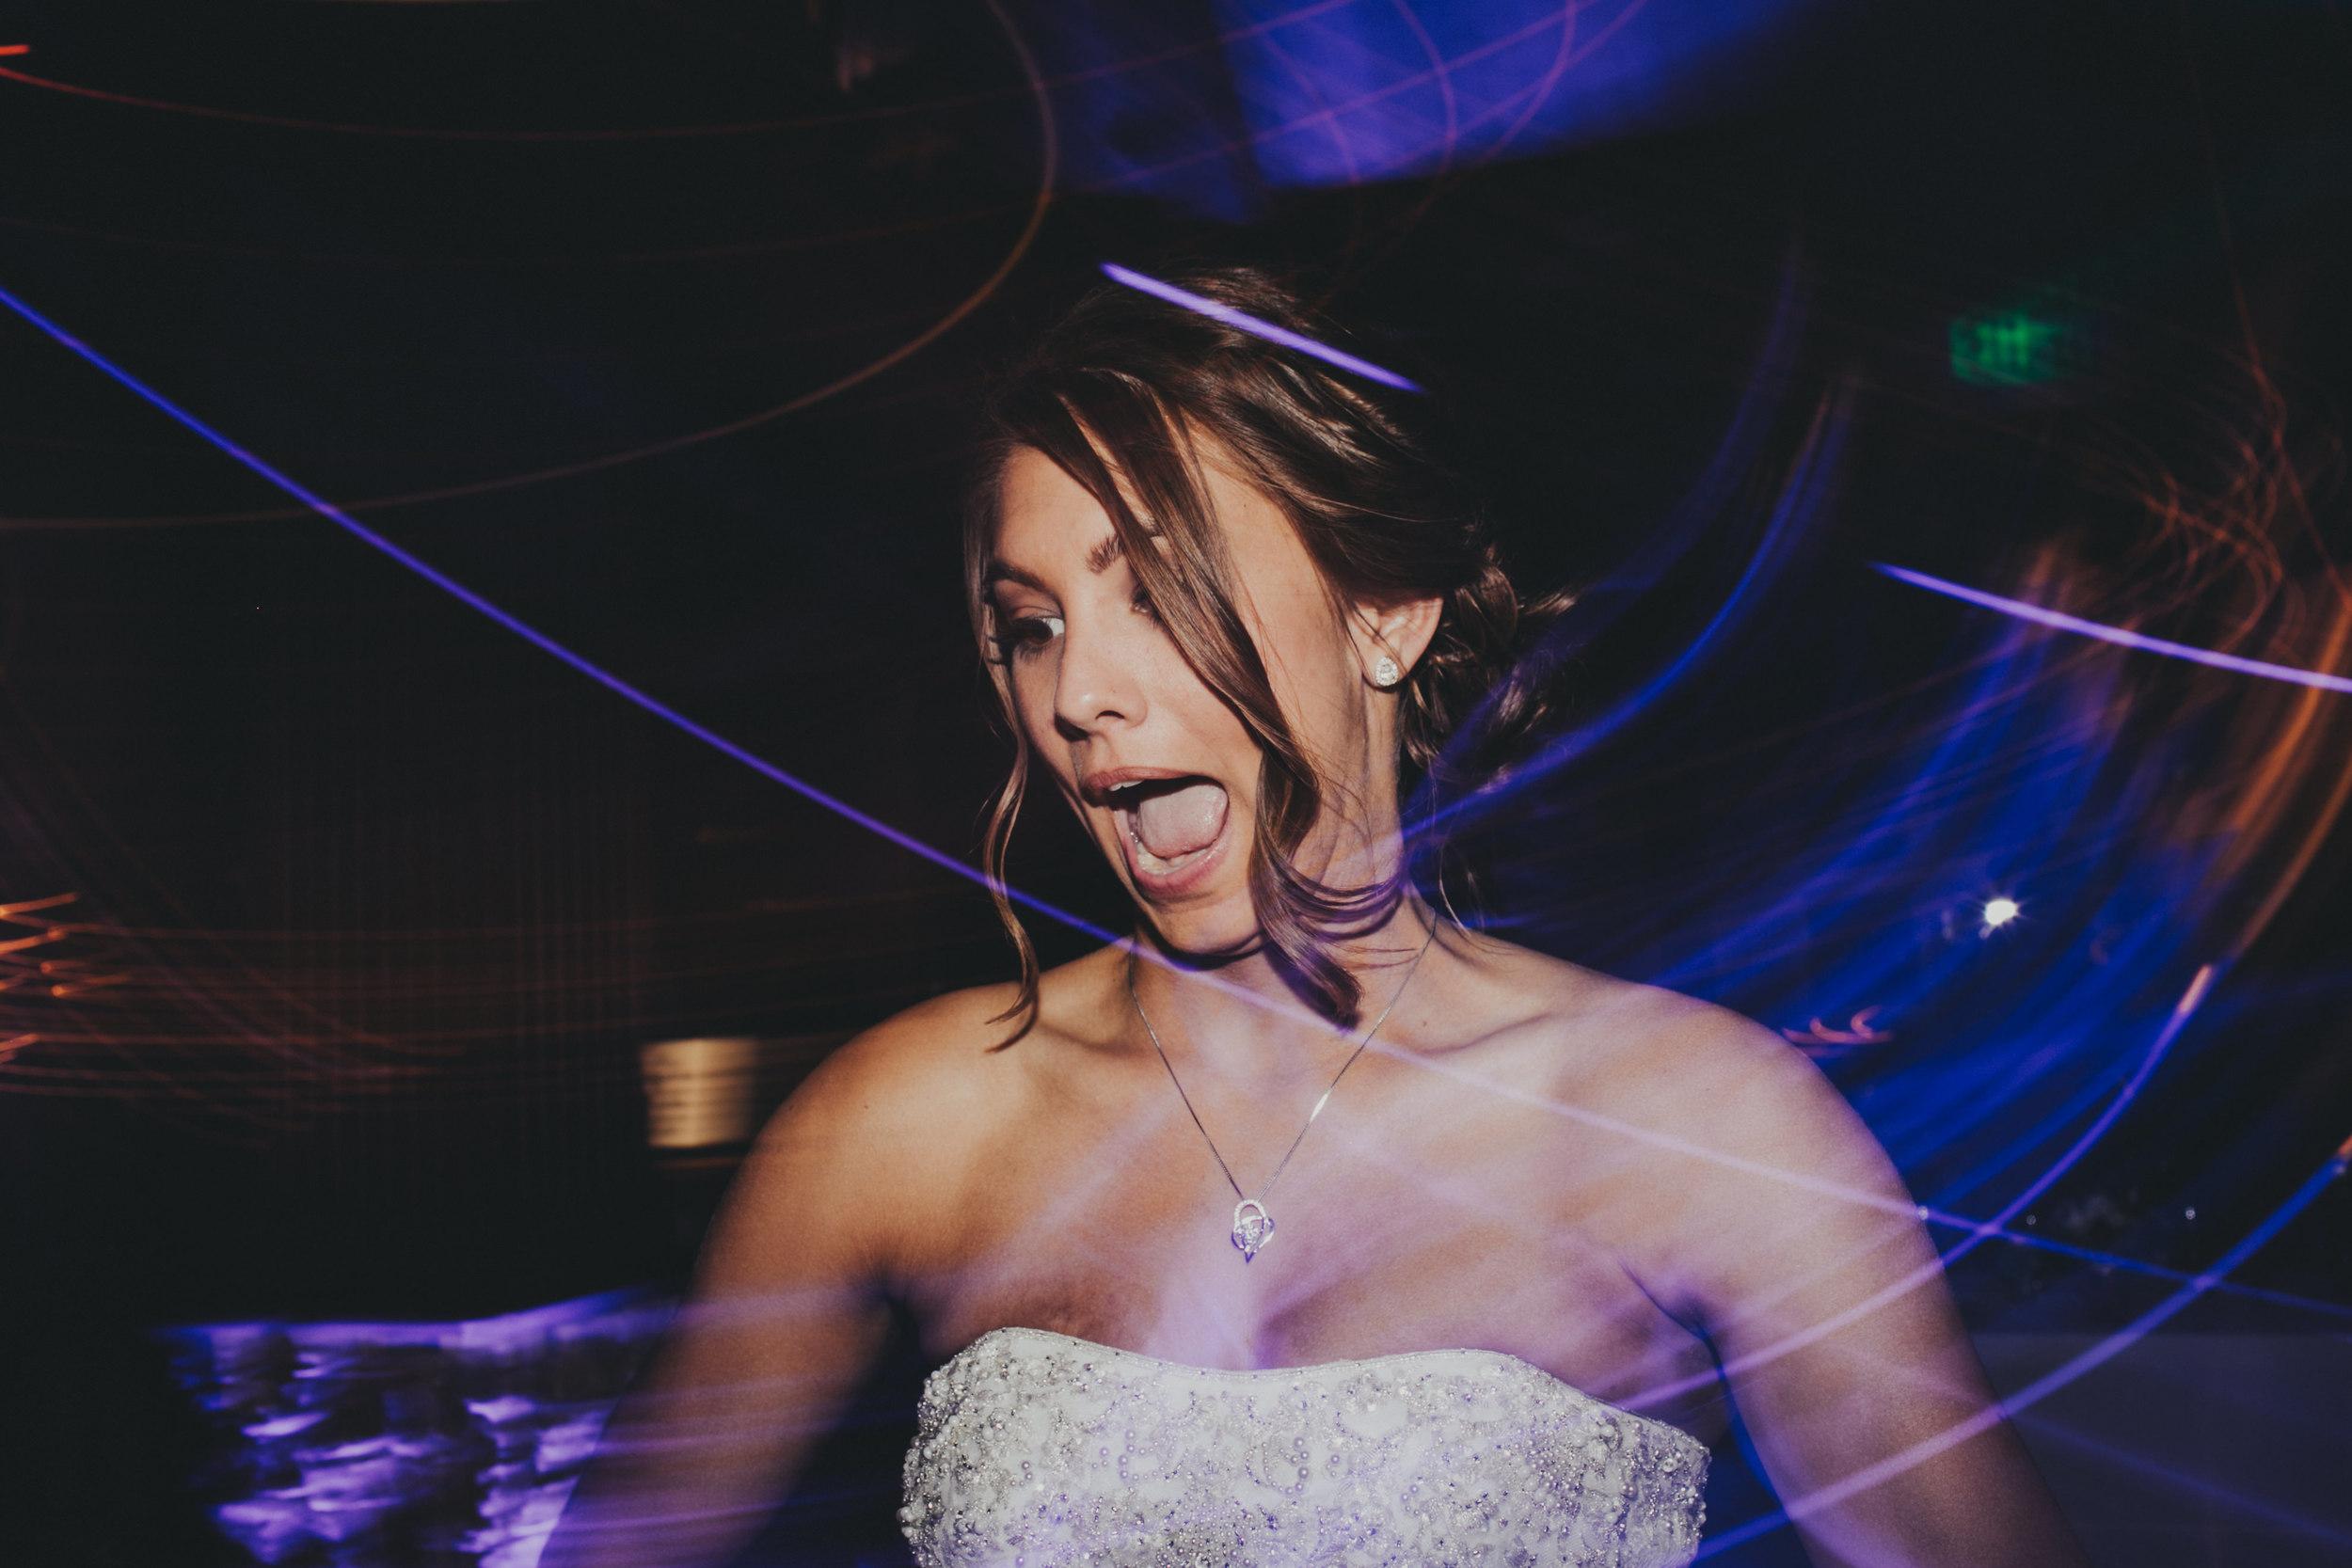 Cheyenne + Jordan - Wedding, Natalie Griffo (154 of 157).jpg